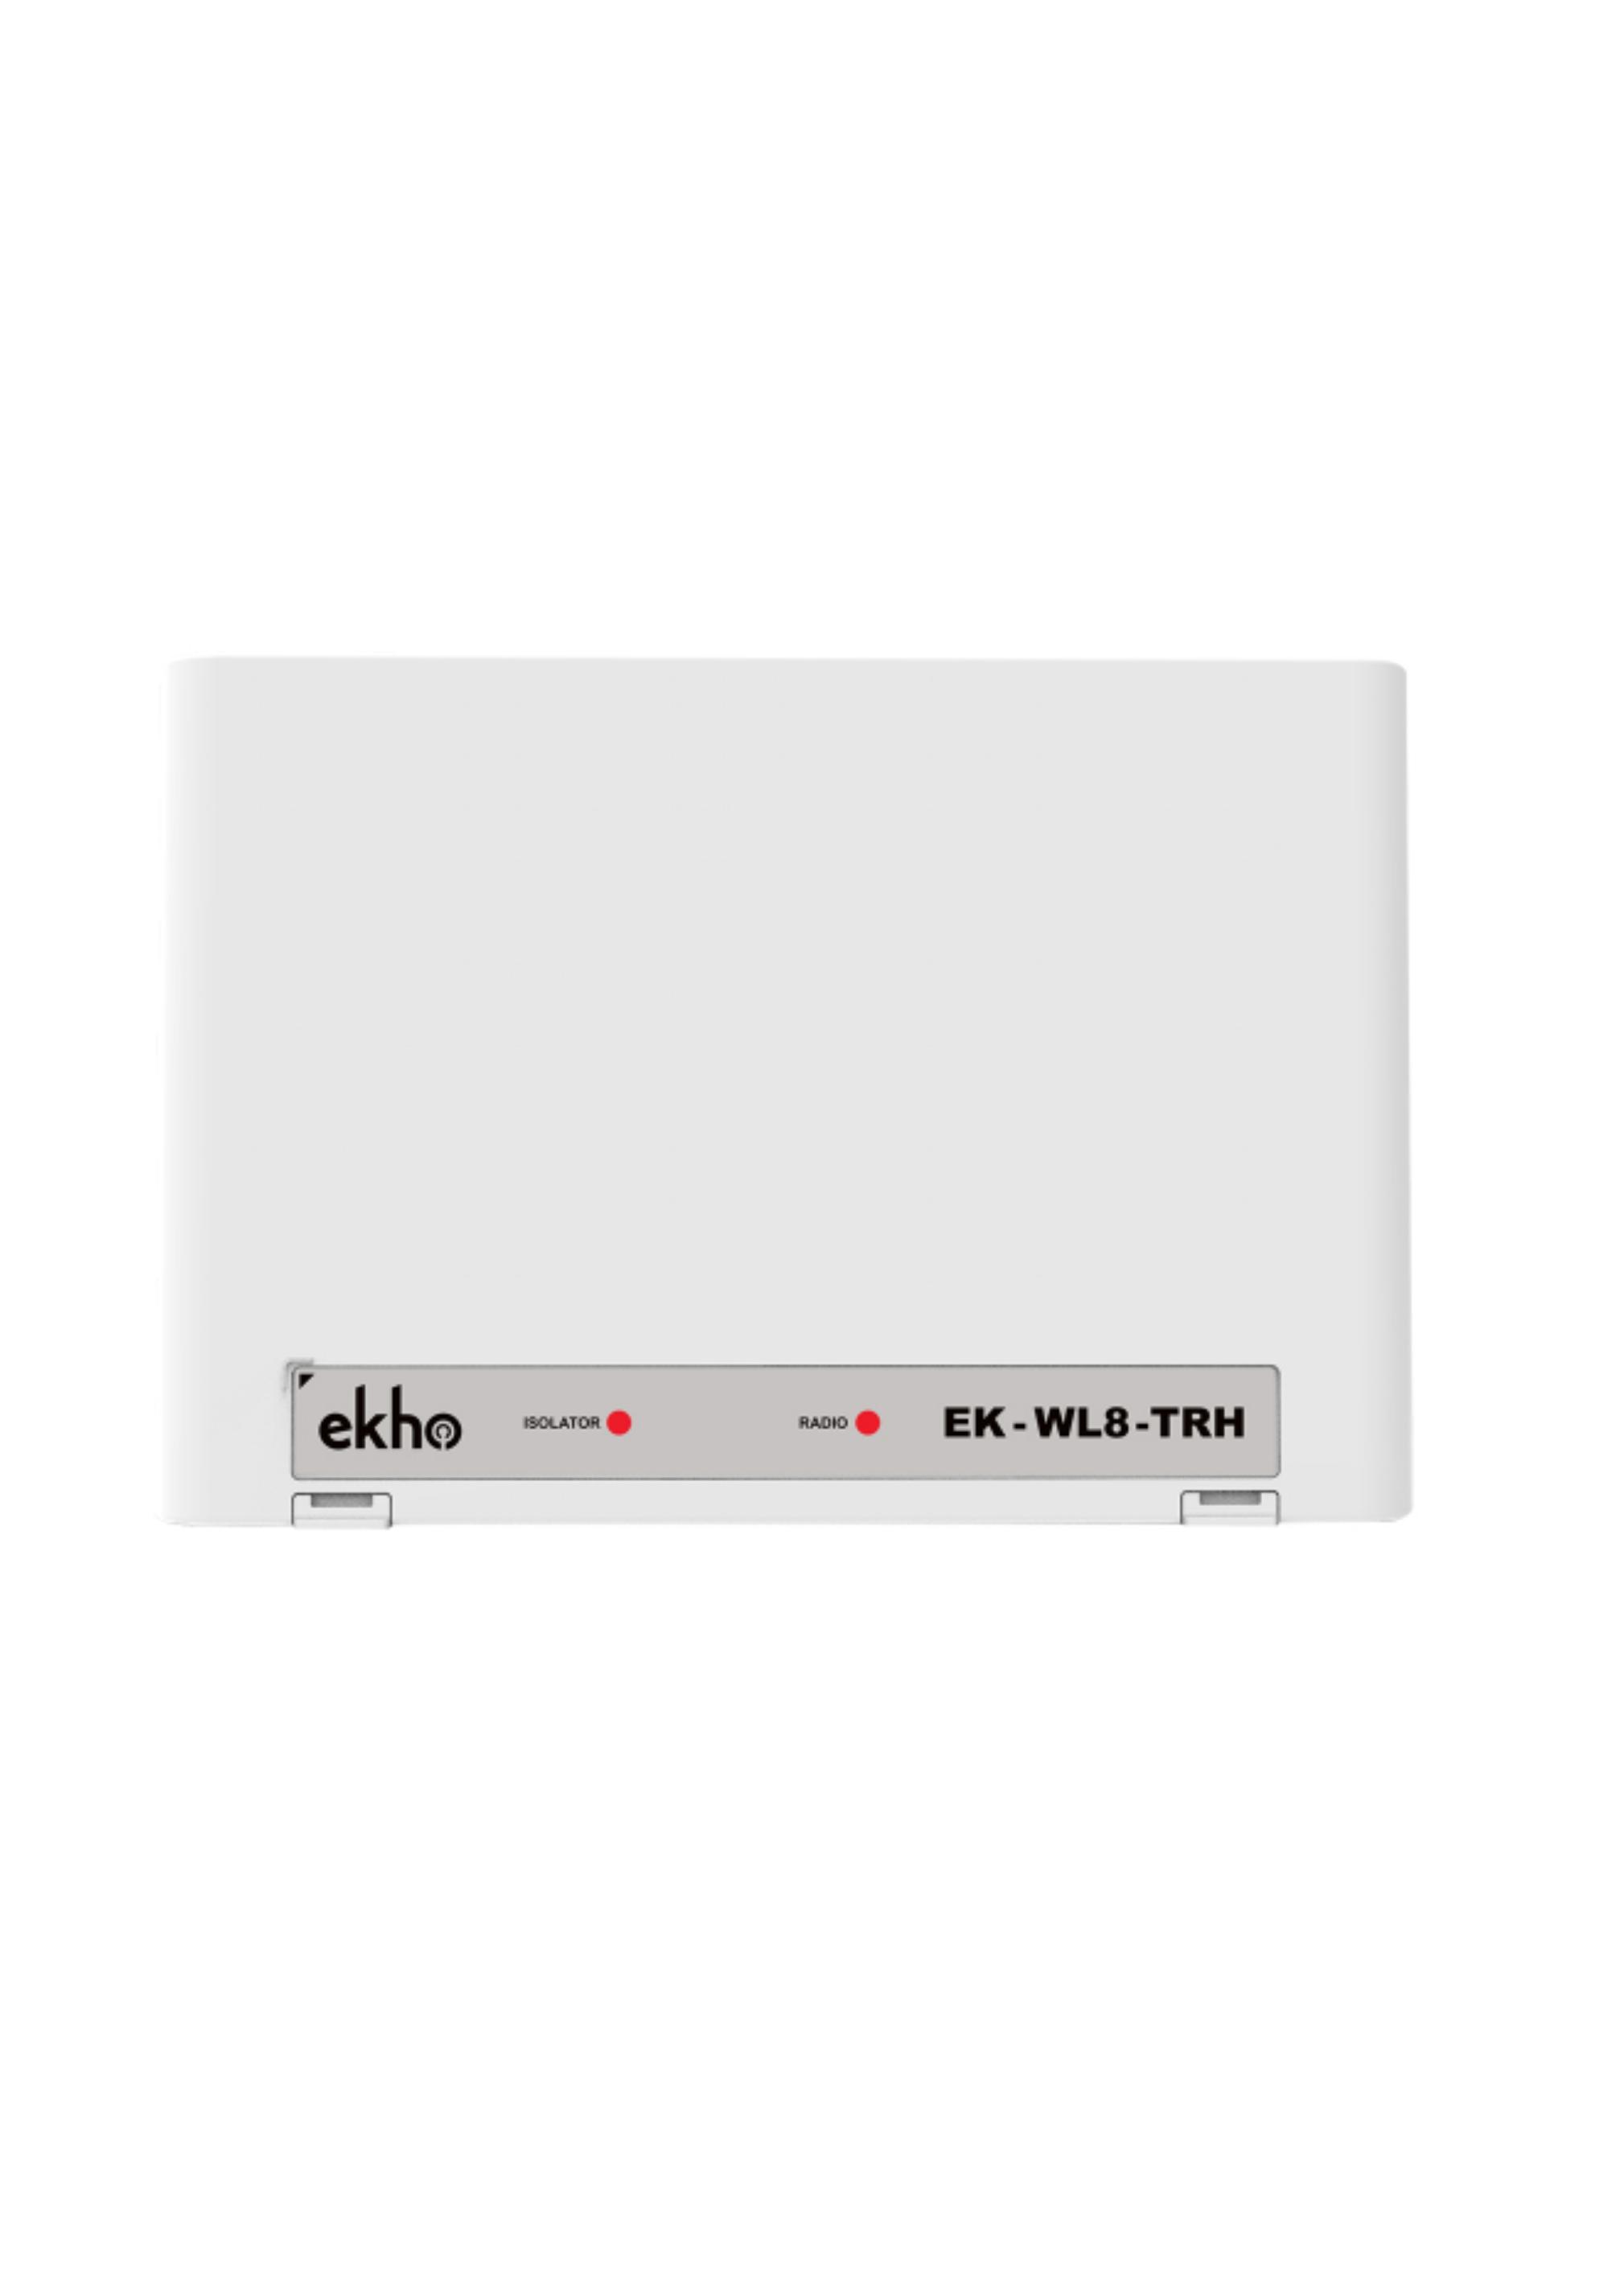 EKHO Hybrid Wireless Translator Module 1630170-00